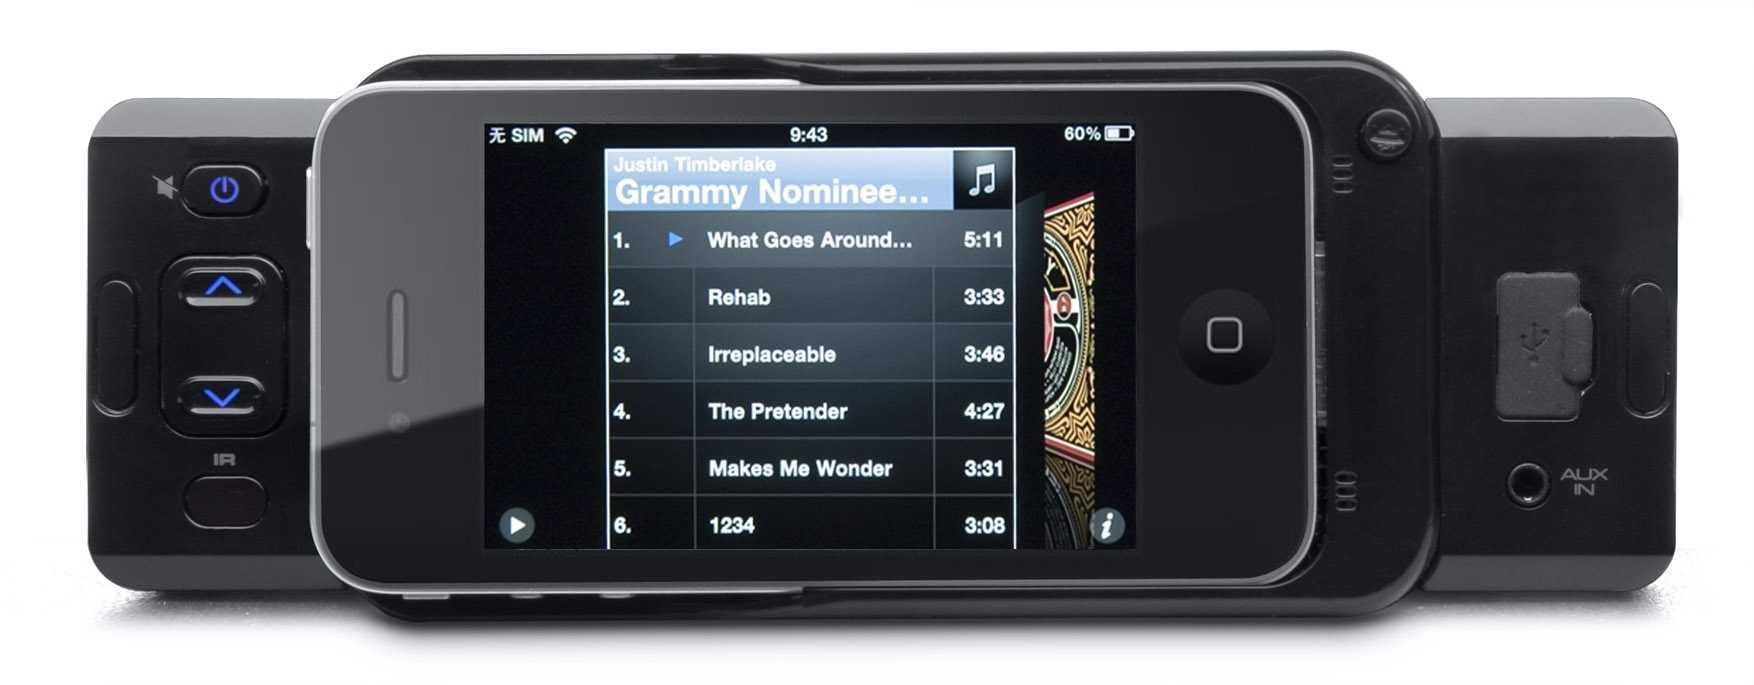 autoradio mit dock f r iphone 3g bis 4s mac i. Black Bedroom Furniture Sets. Home Design Ideas